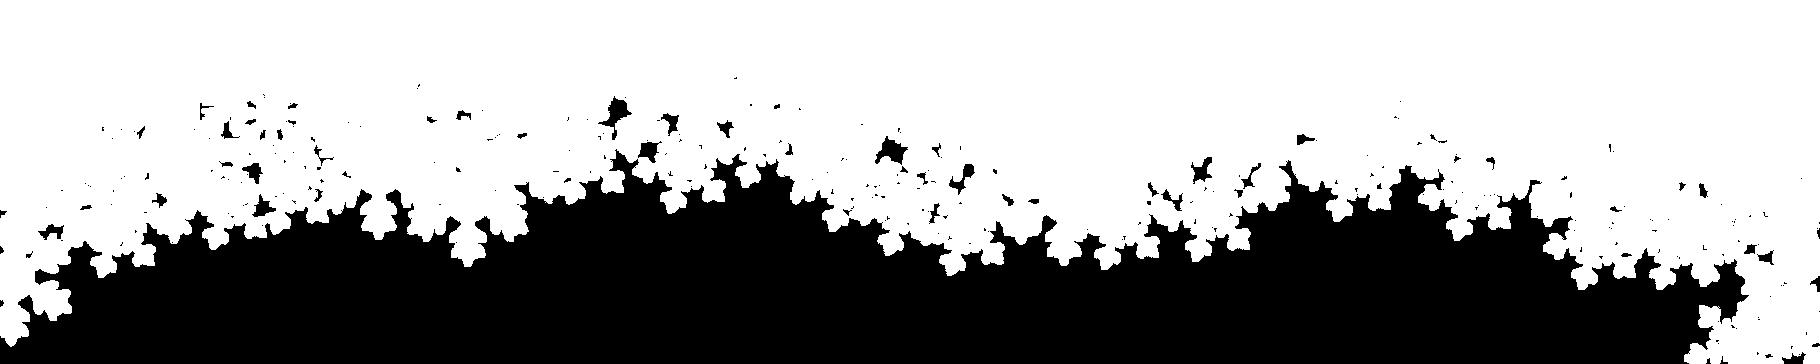 SnowflakeBanner-2.png